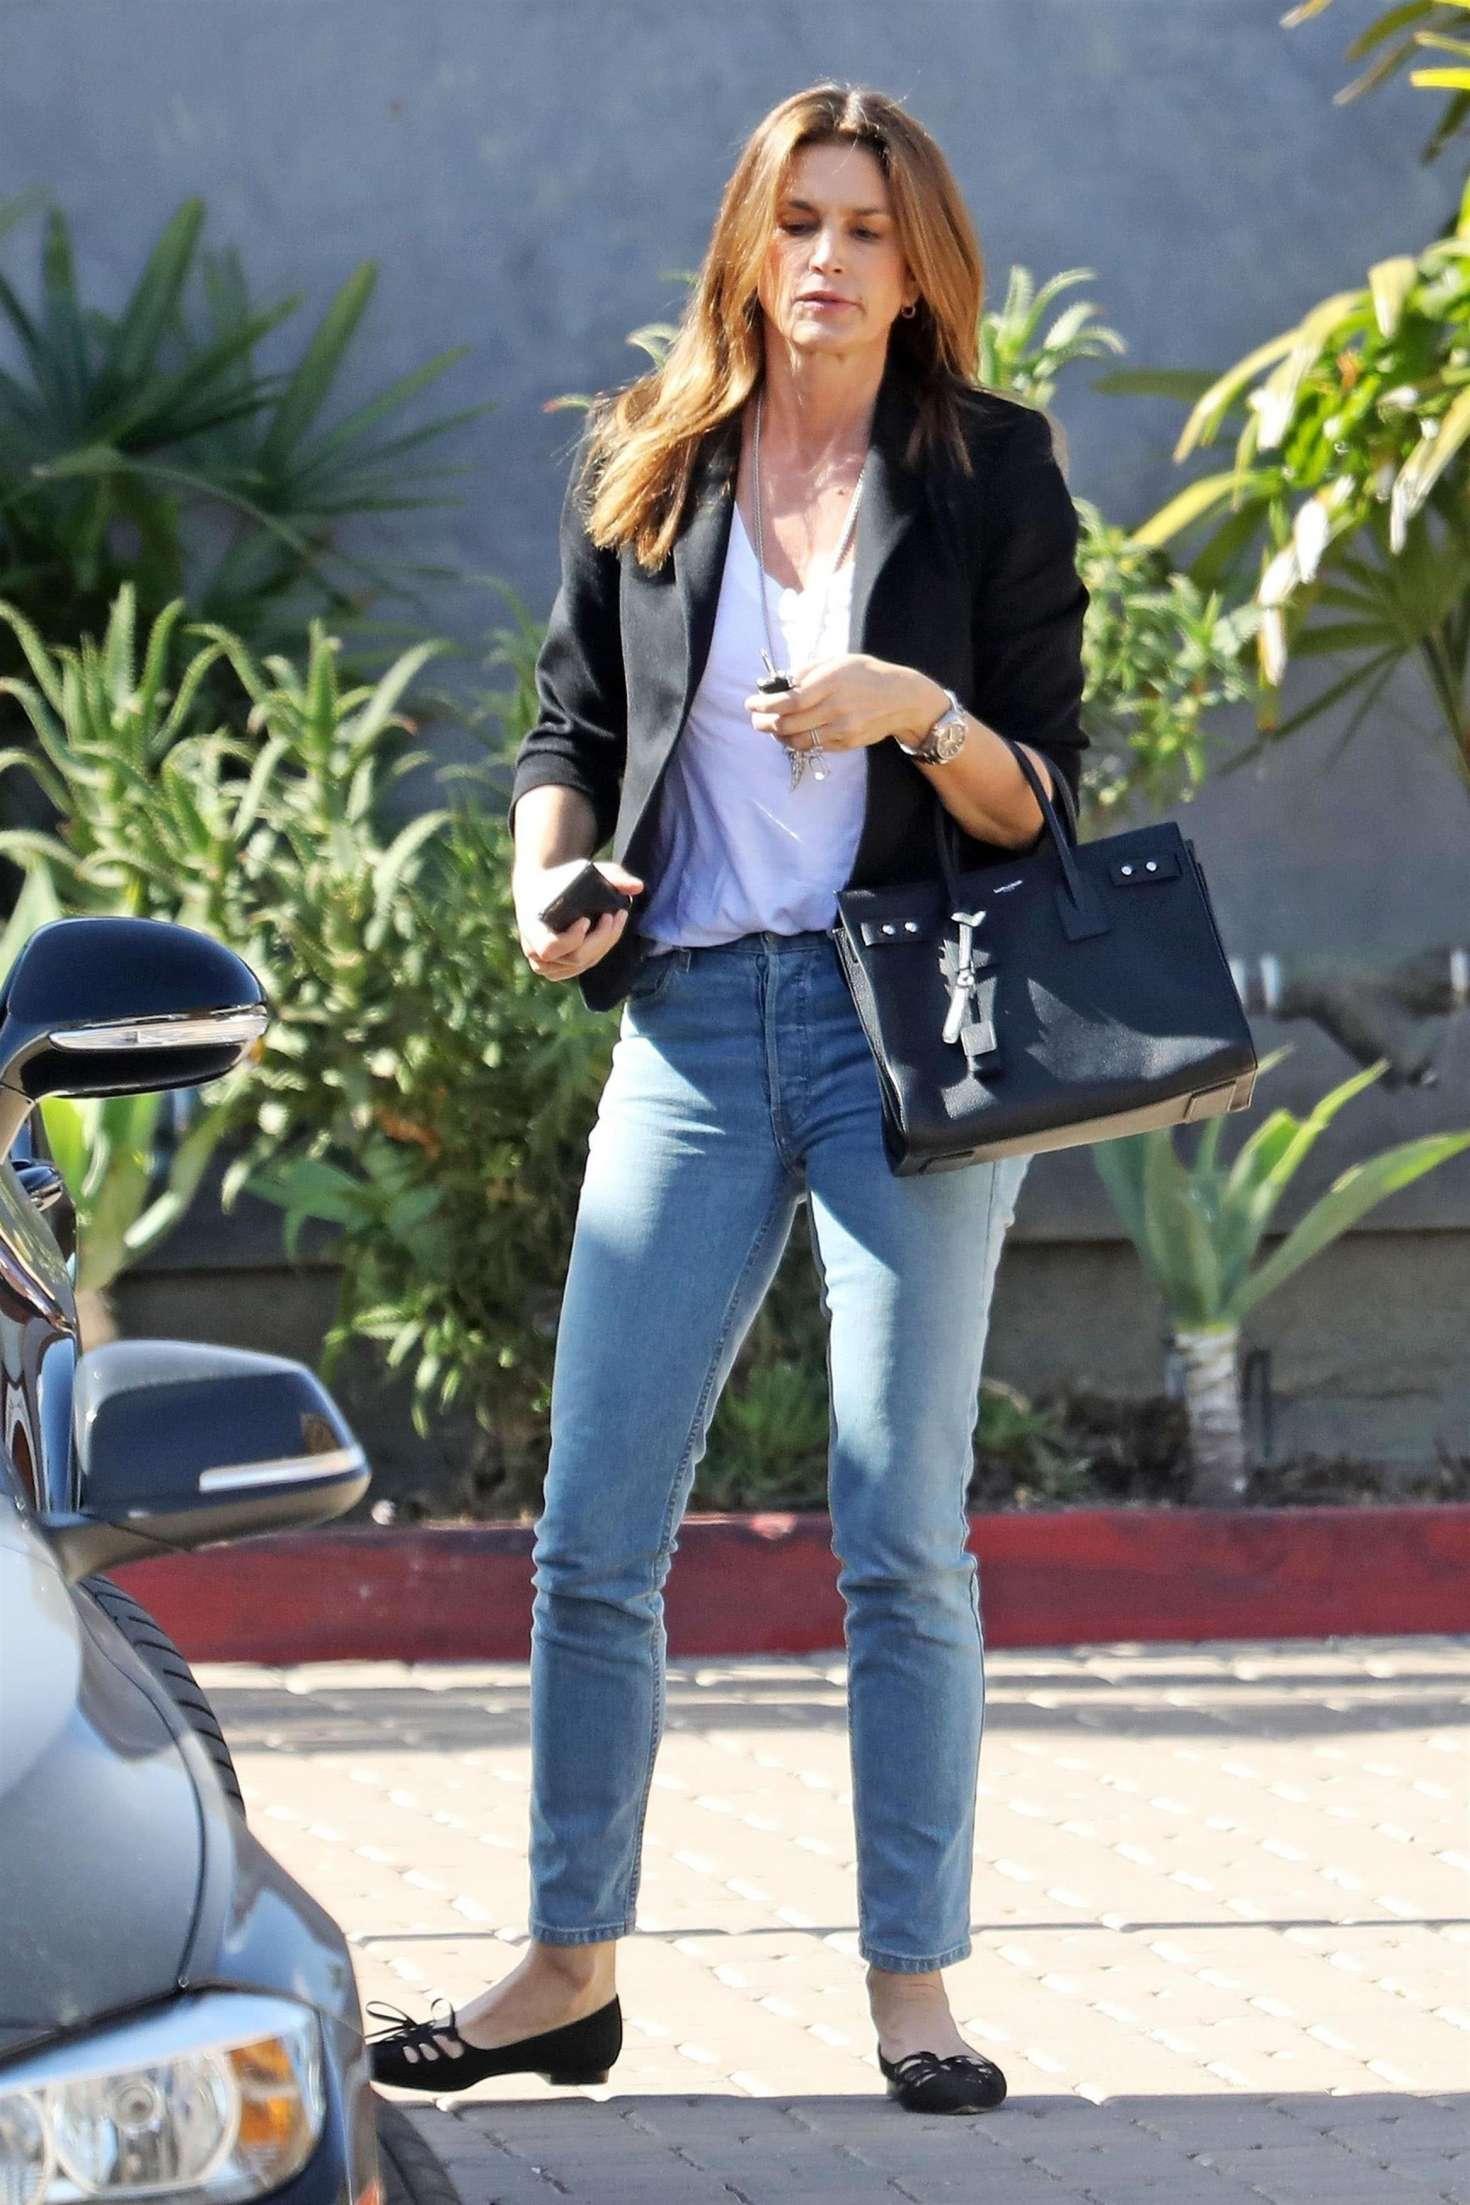 Синди кроуфорд коллекция джинсов фото самого